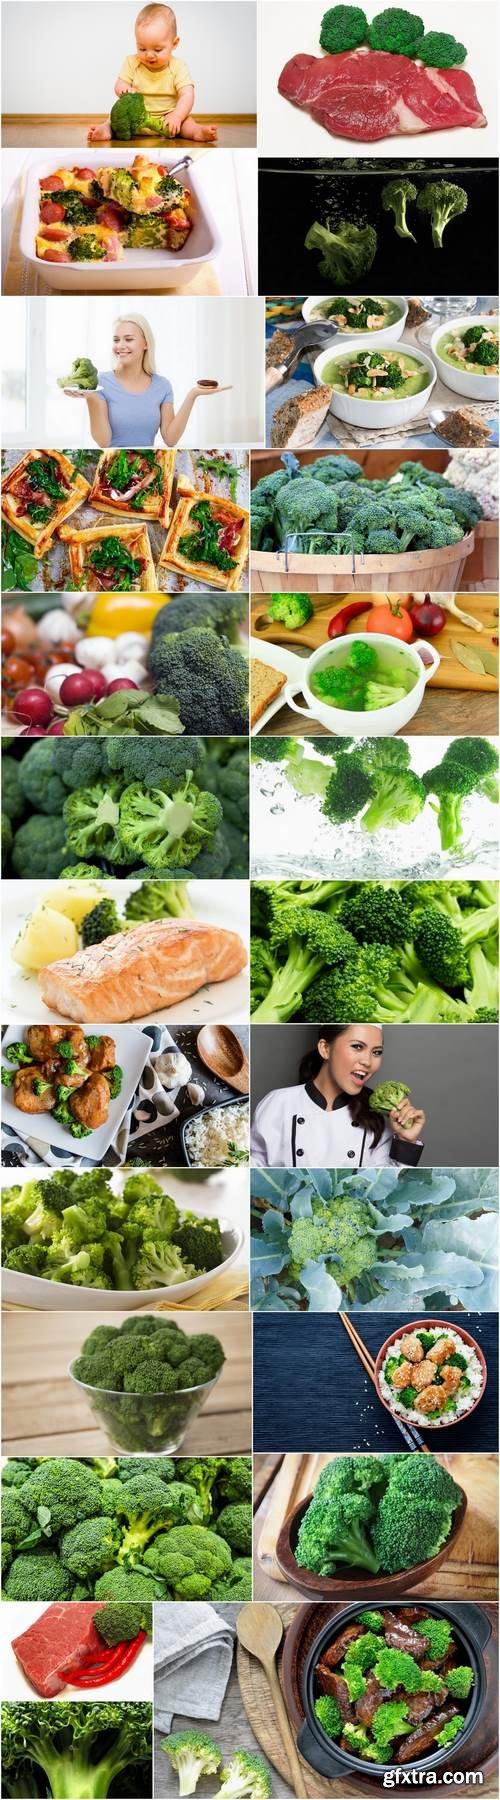 Broccoli cabbage food meal dish 25 HQ Jpeg